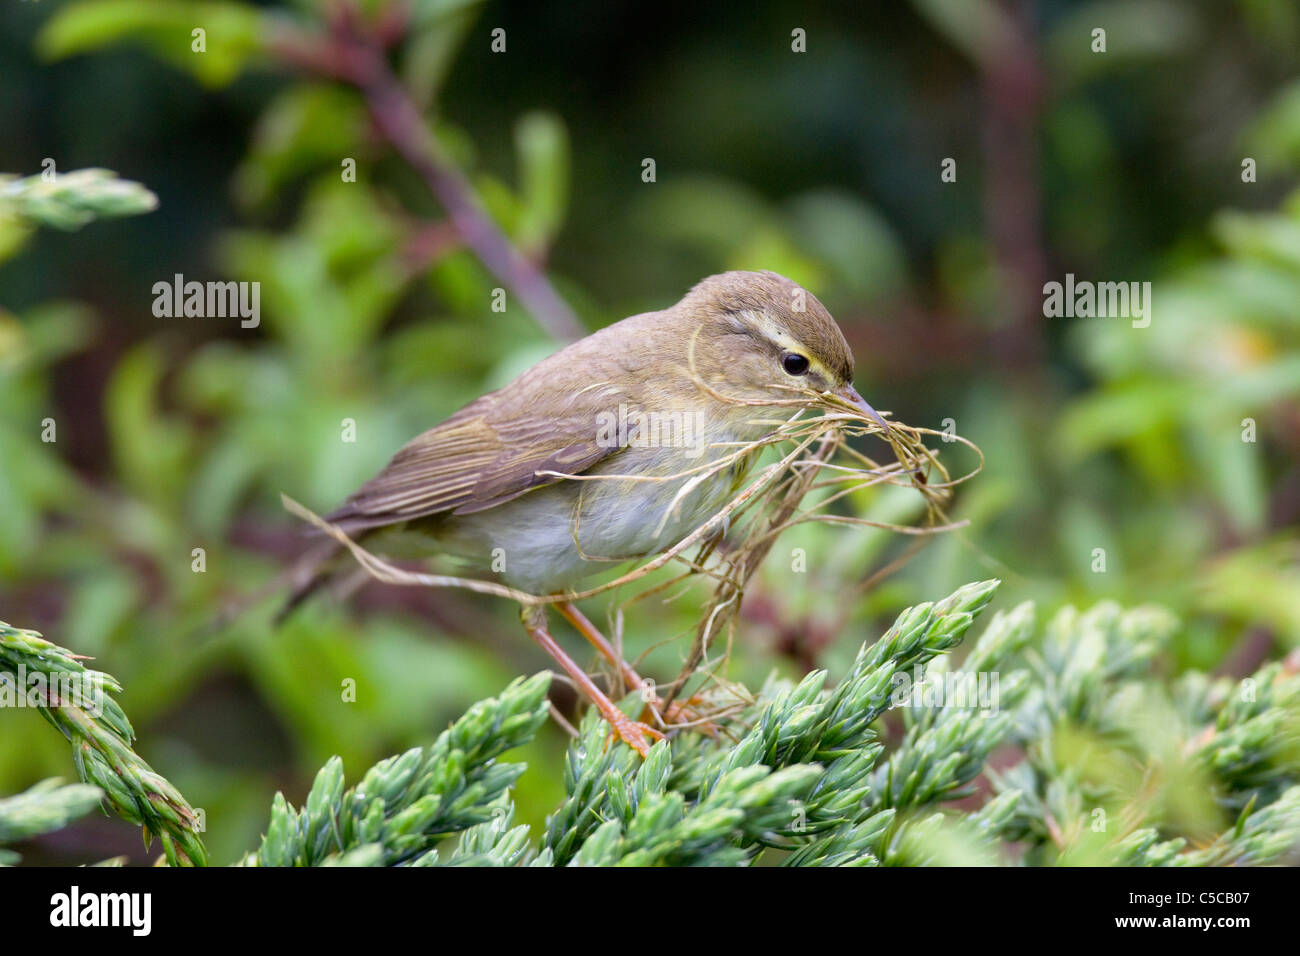 Fitis; Phylloscopus Trochilus; Schottland; mit Verschachtelung material Stockbild